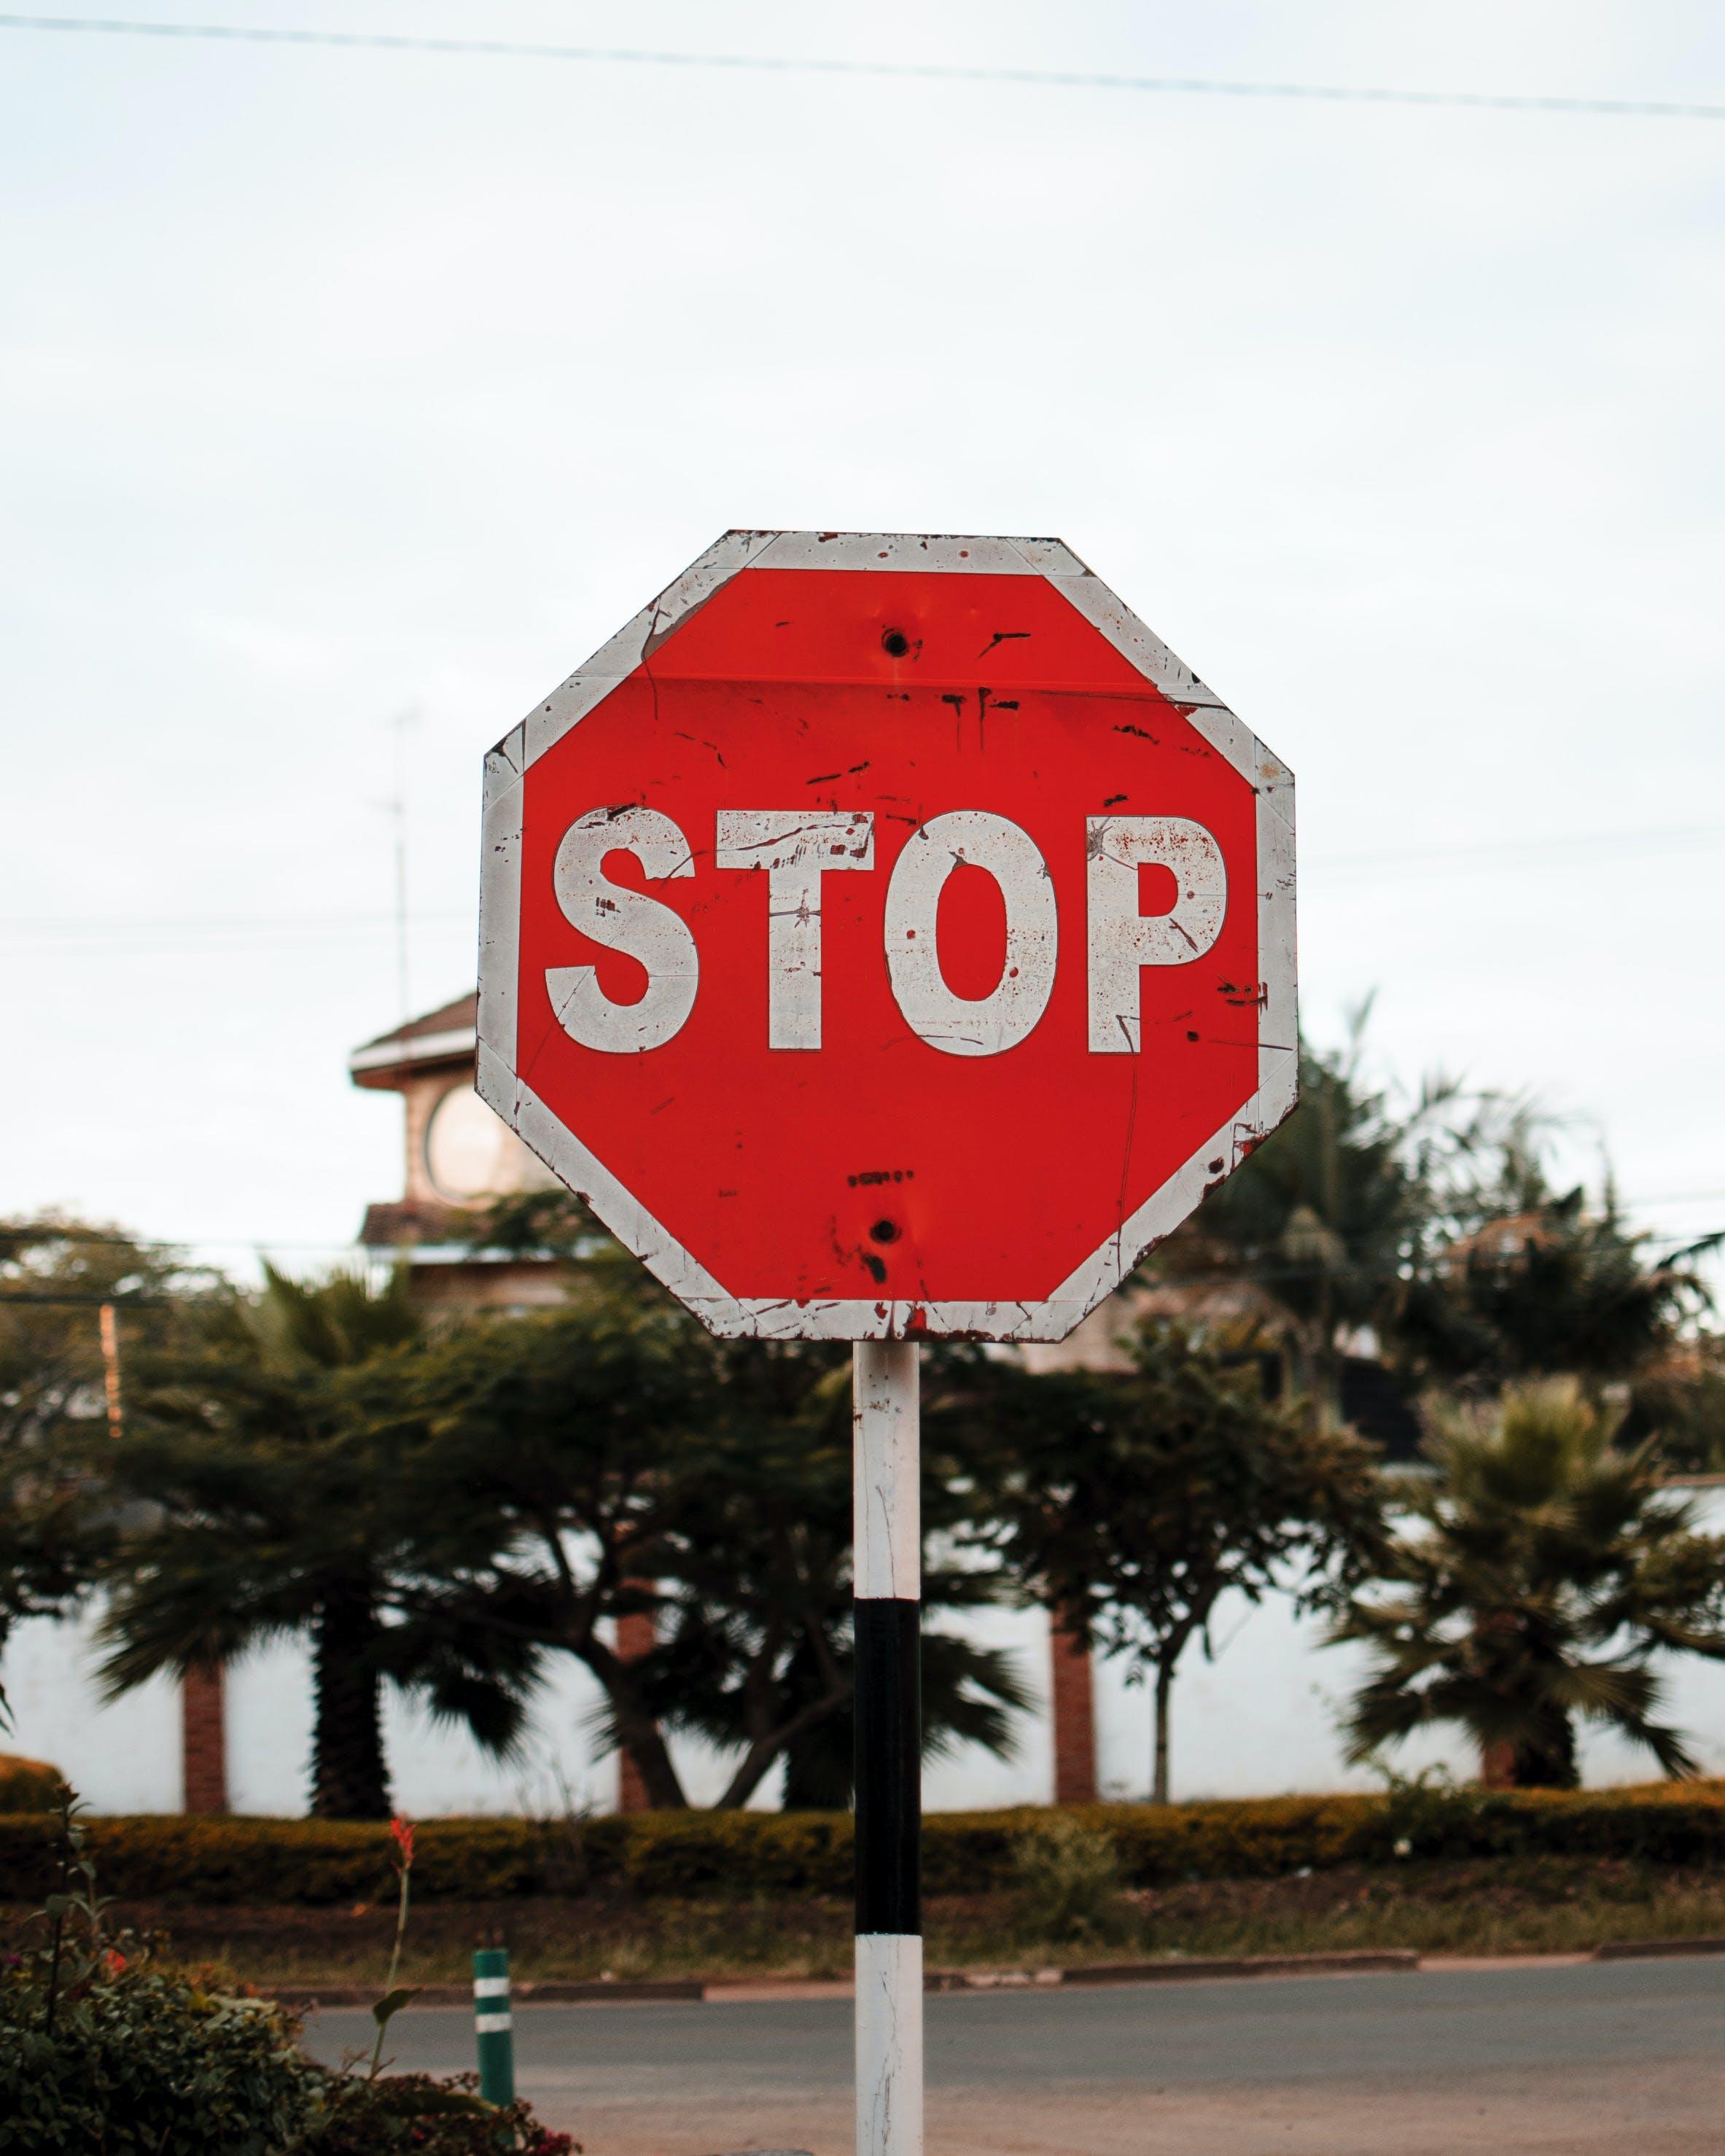 advertència, aturar, avís